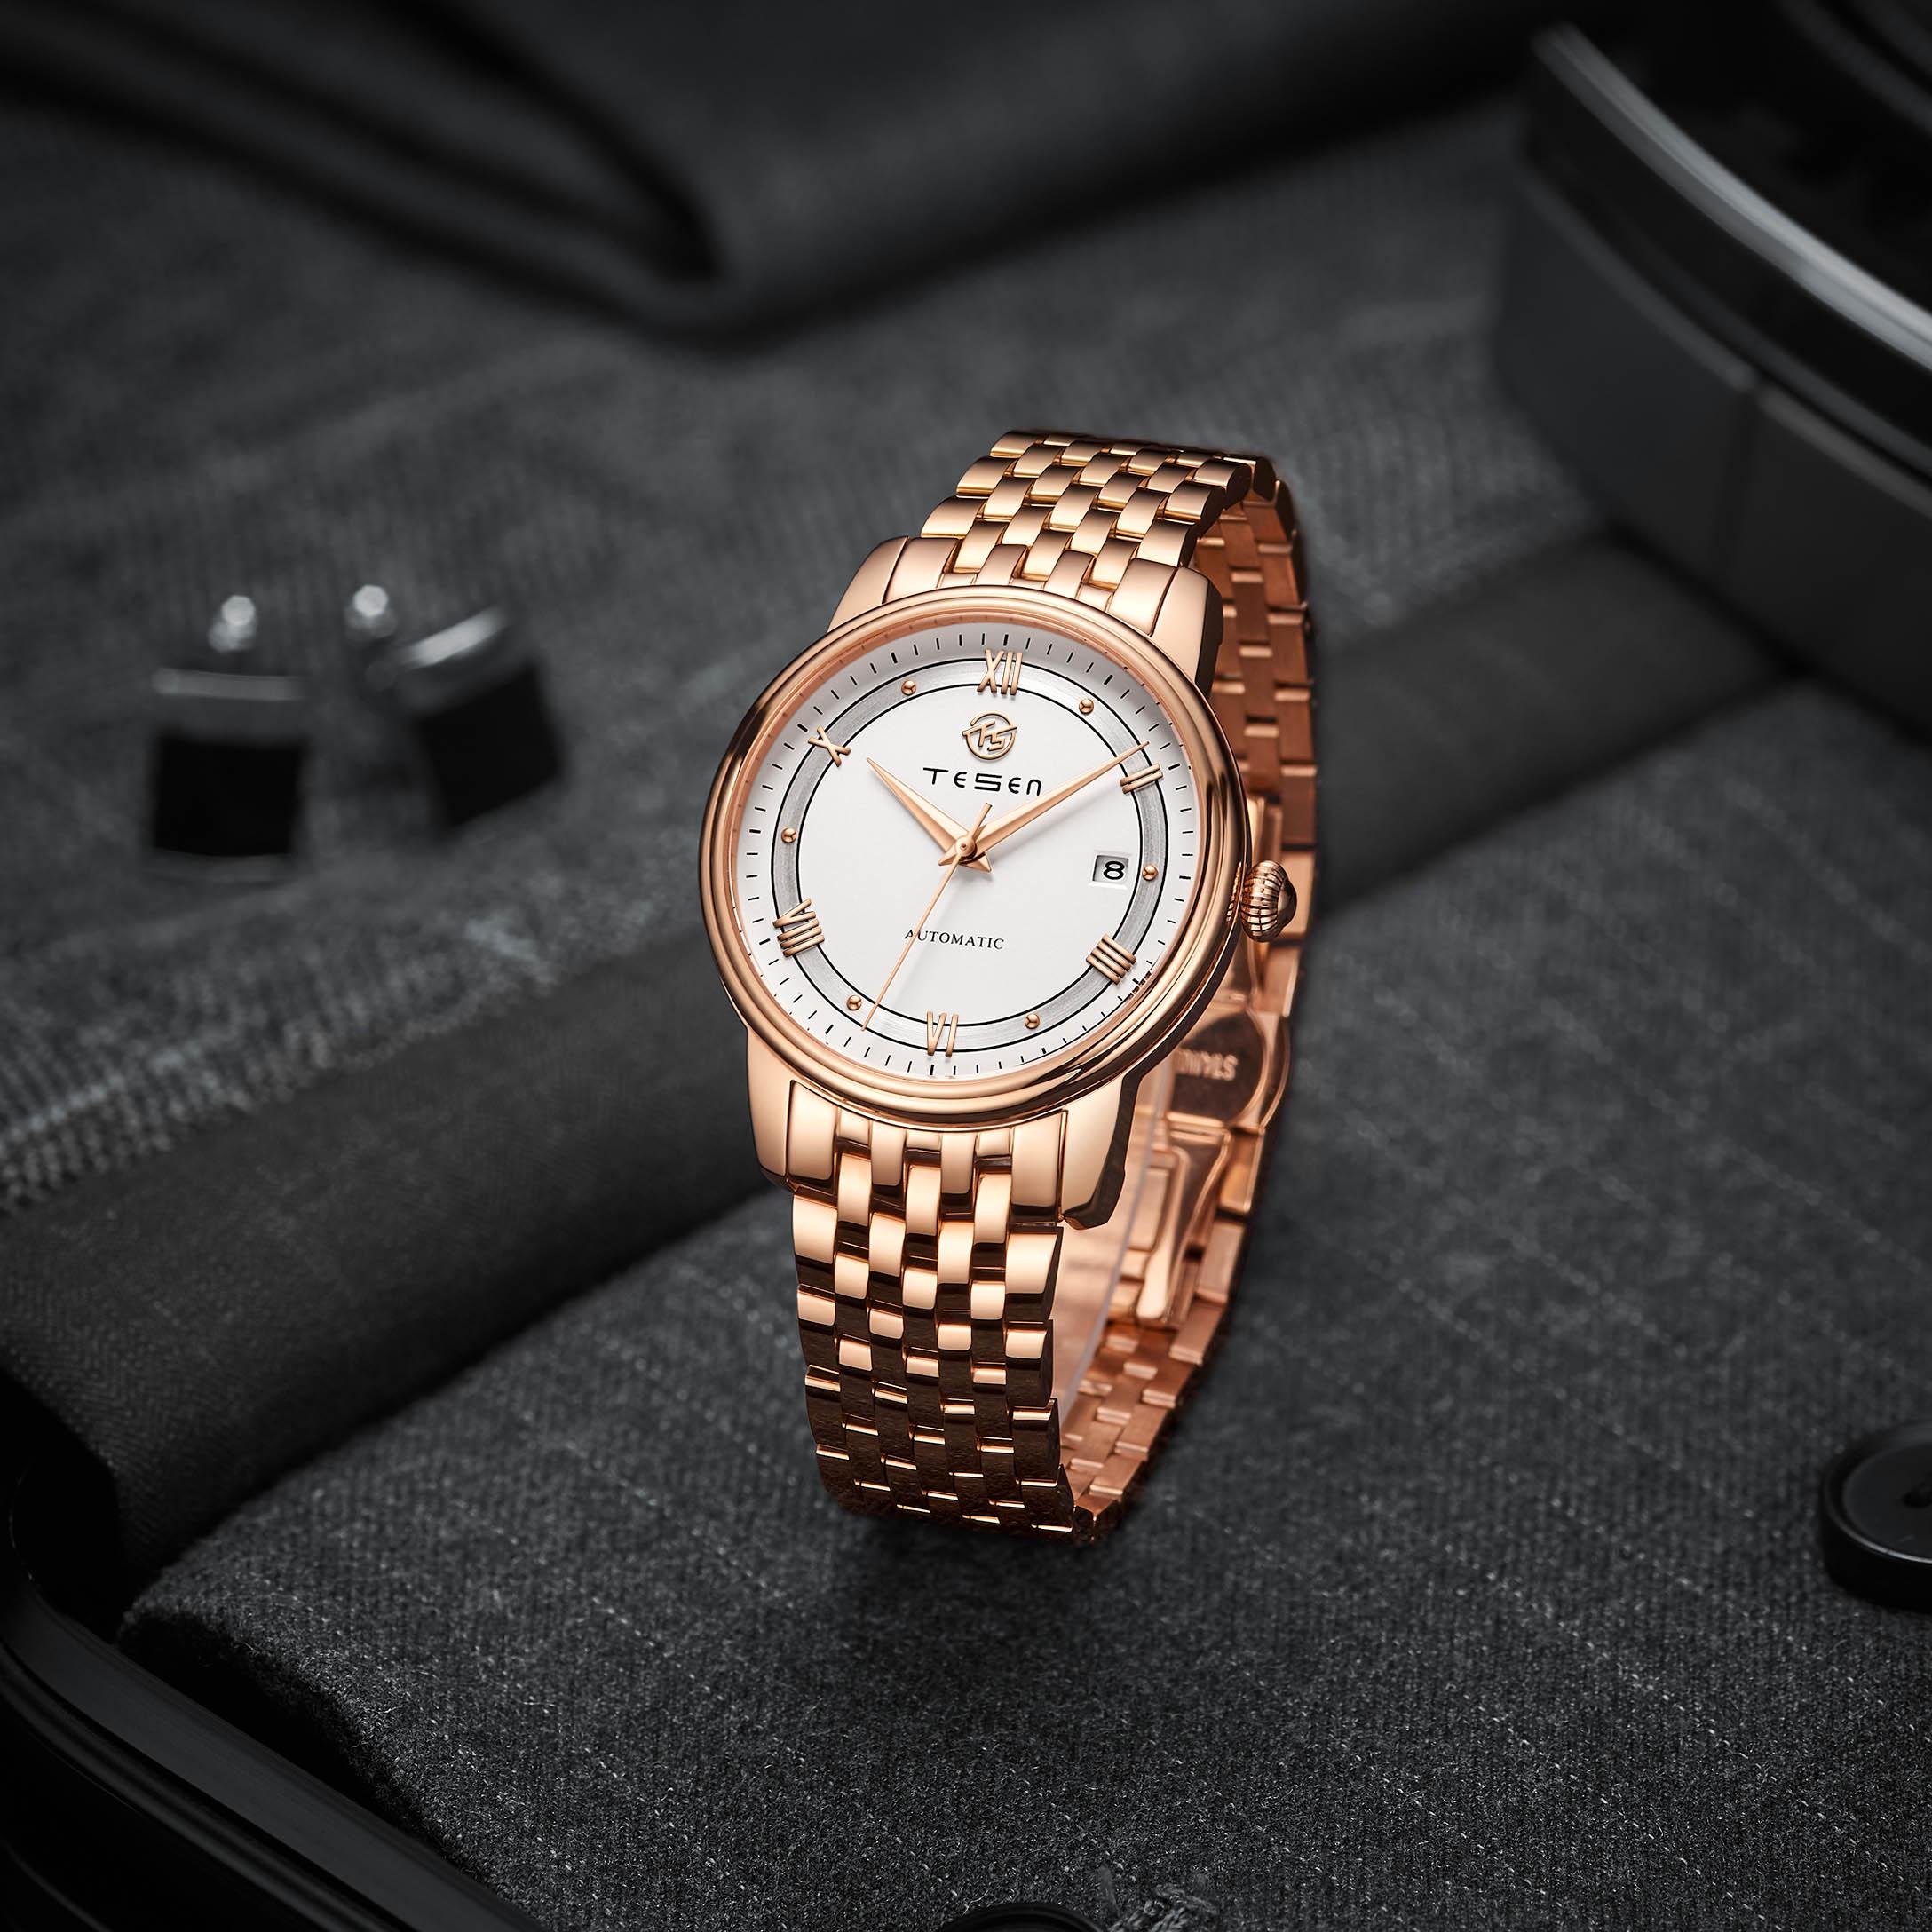 2021TESEN ORIENT MASCULINO Automatic Mechanic Watch Men Watch Men Luxury Brand Sports Fashion Stainless Steel Waterproof Watches enlarge